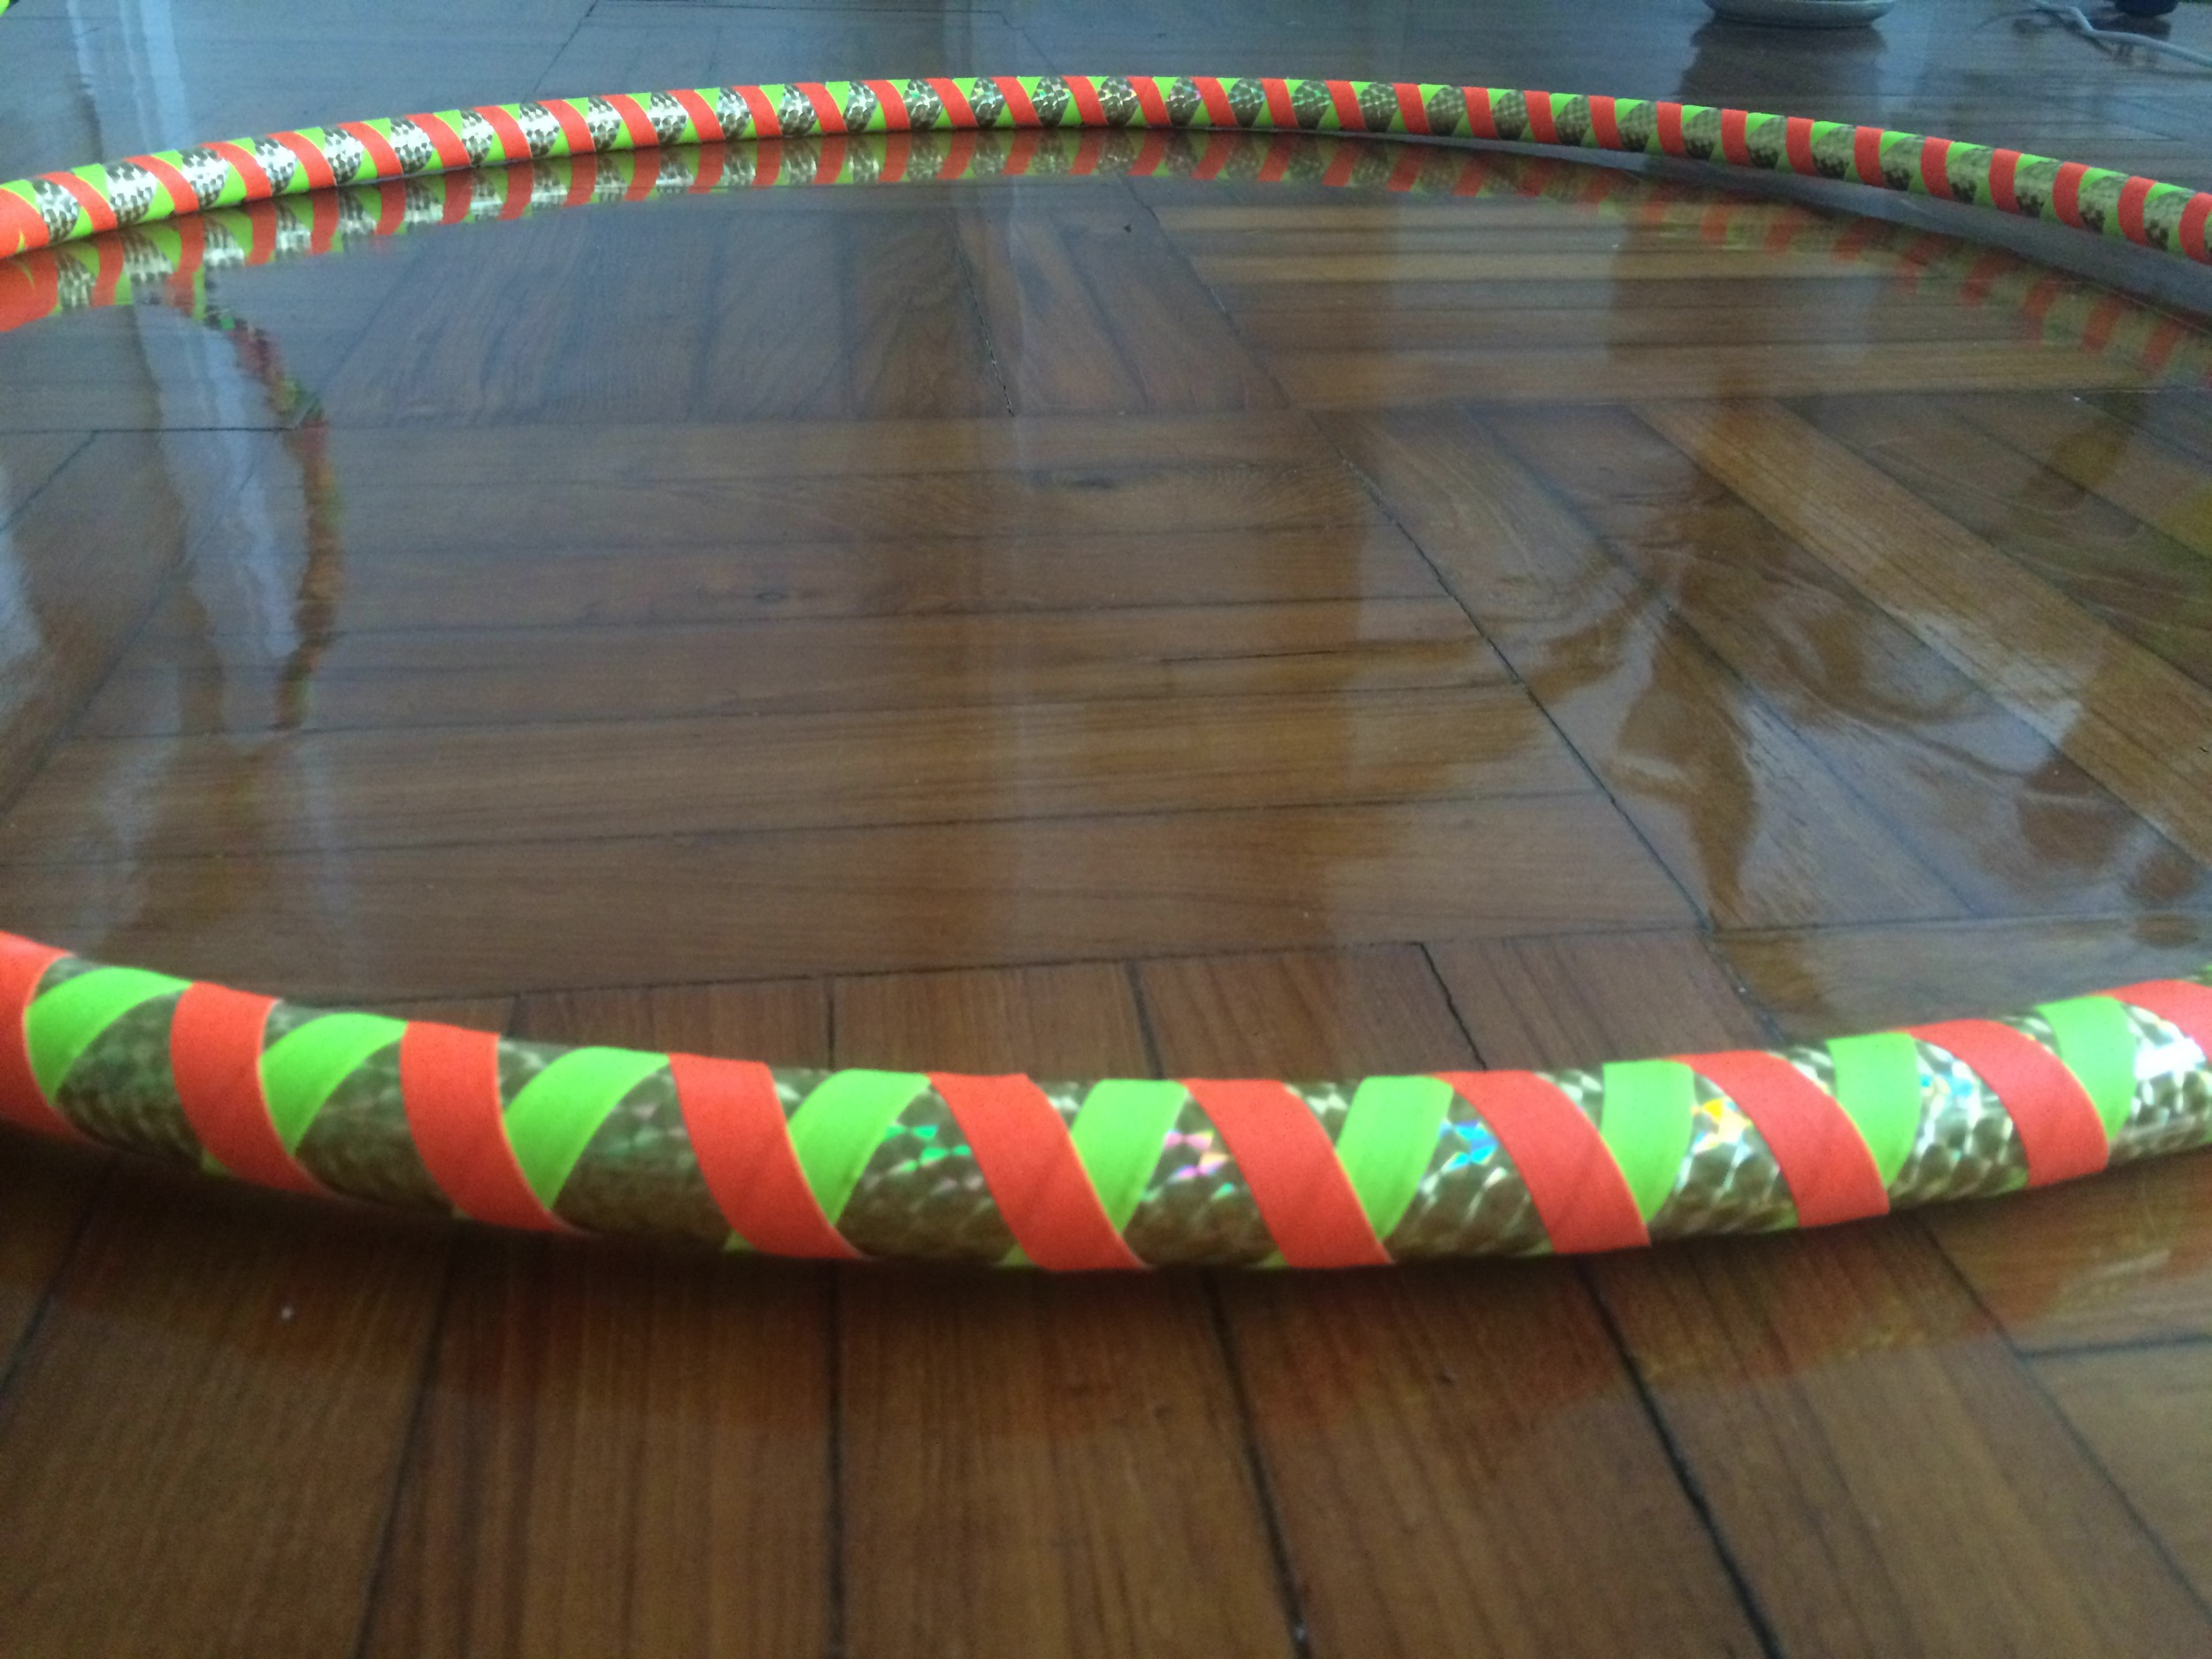 hula hoop for sale hong kong 香港呼啦圈發售